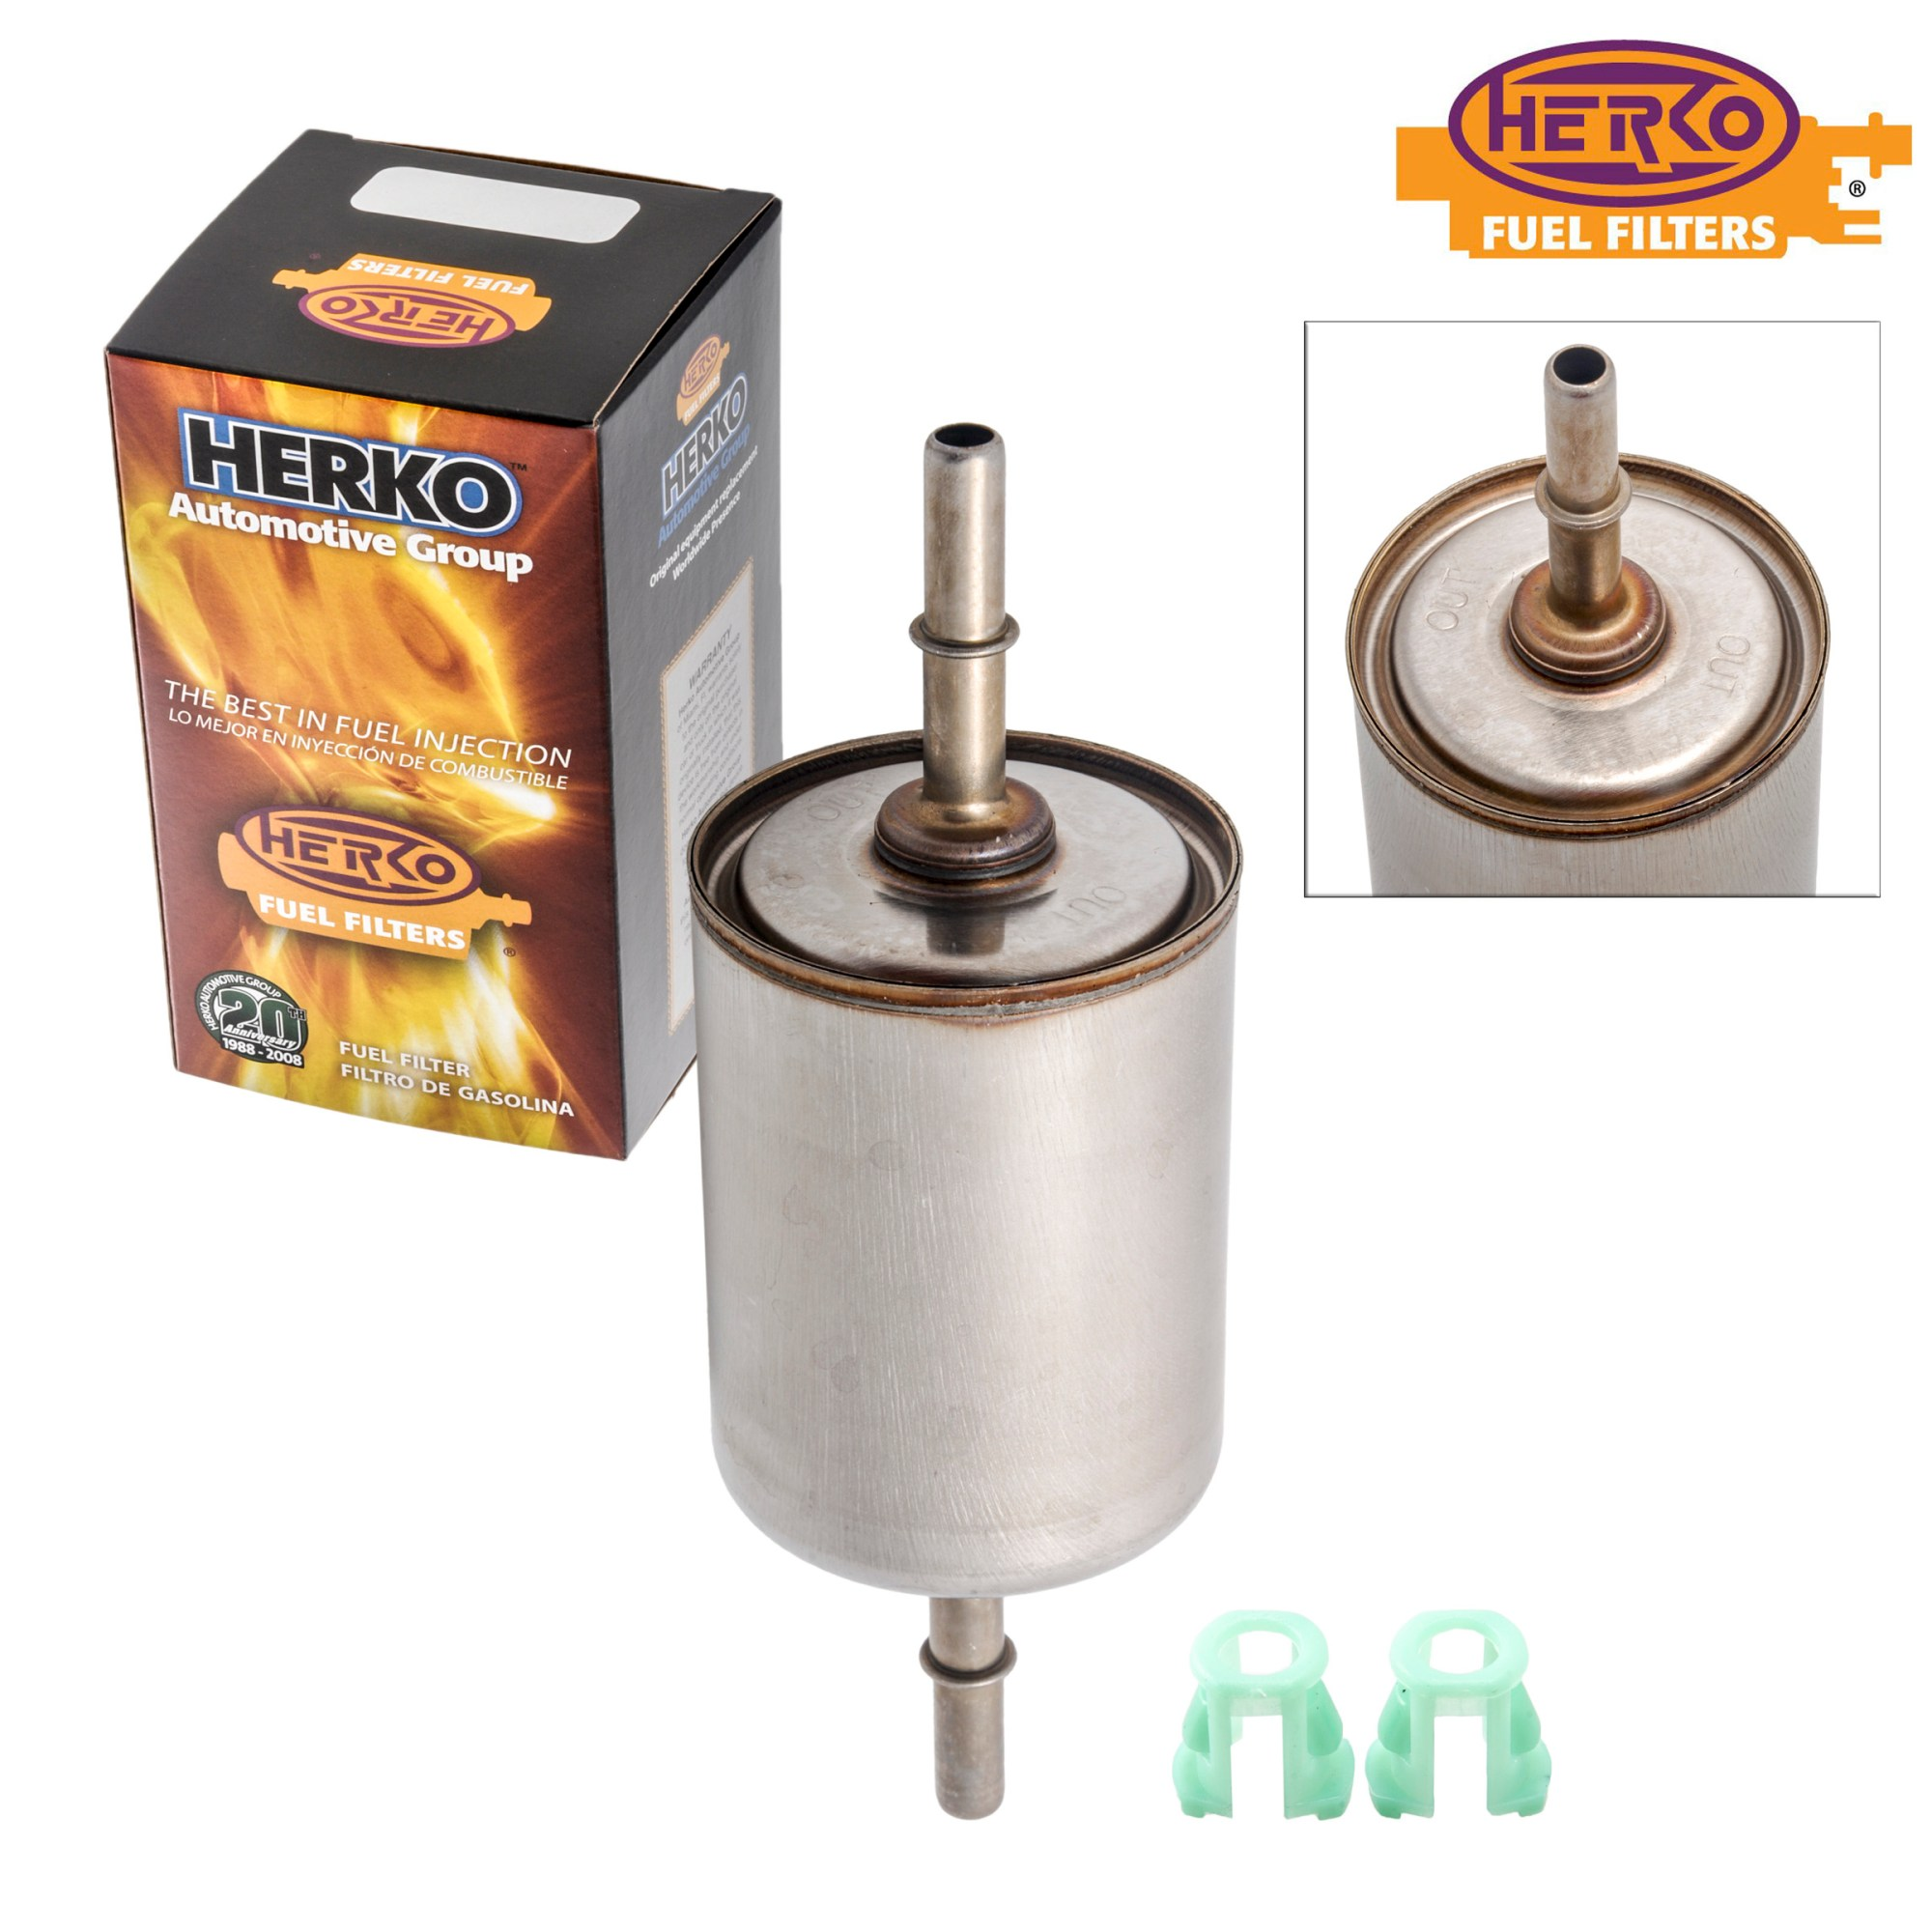 hight resolution of herko fuel filter fgm01 for daewoo saab jaguar buick oldsmobile cadillac 90 07 walmart com